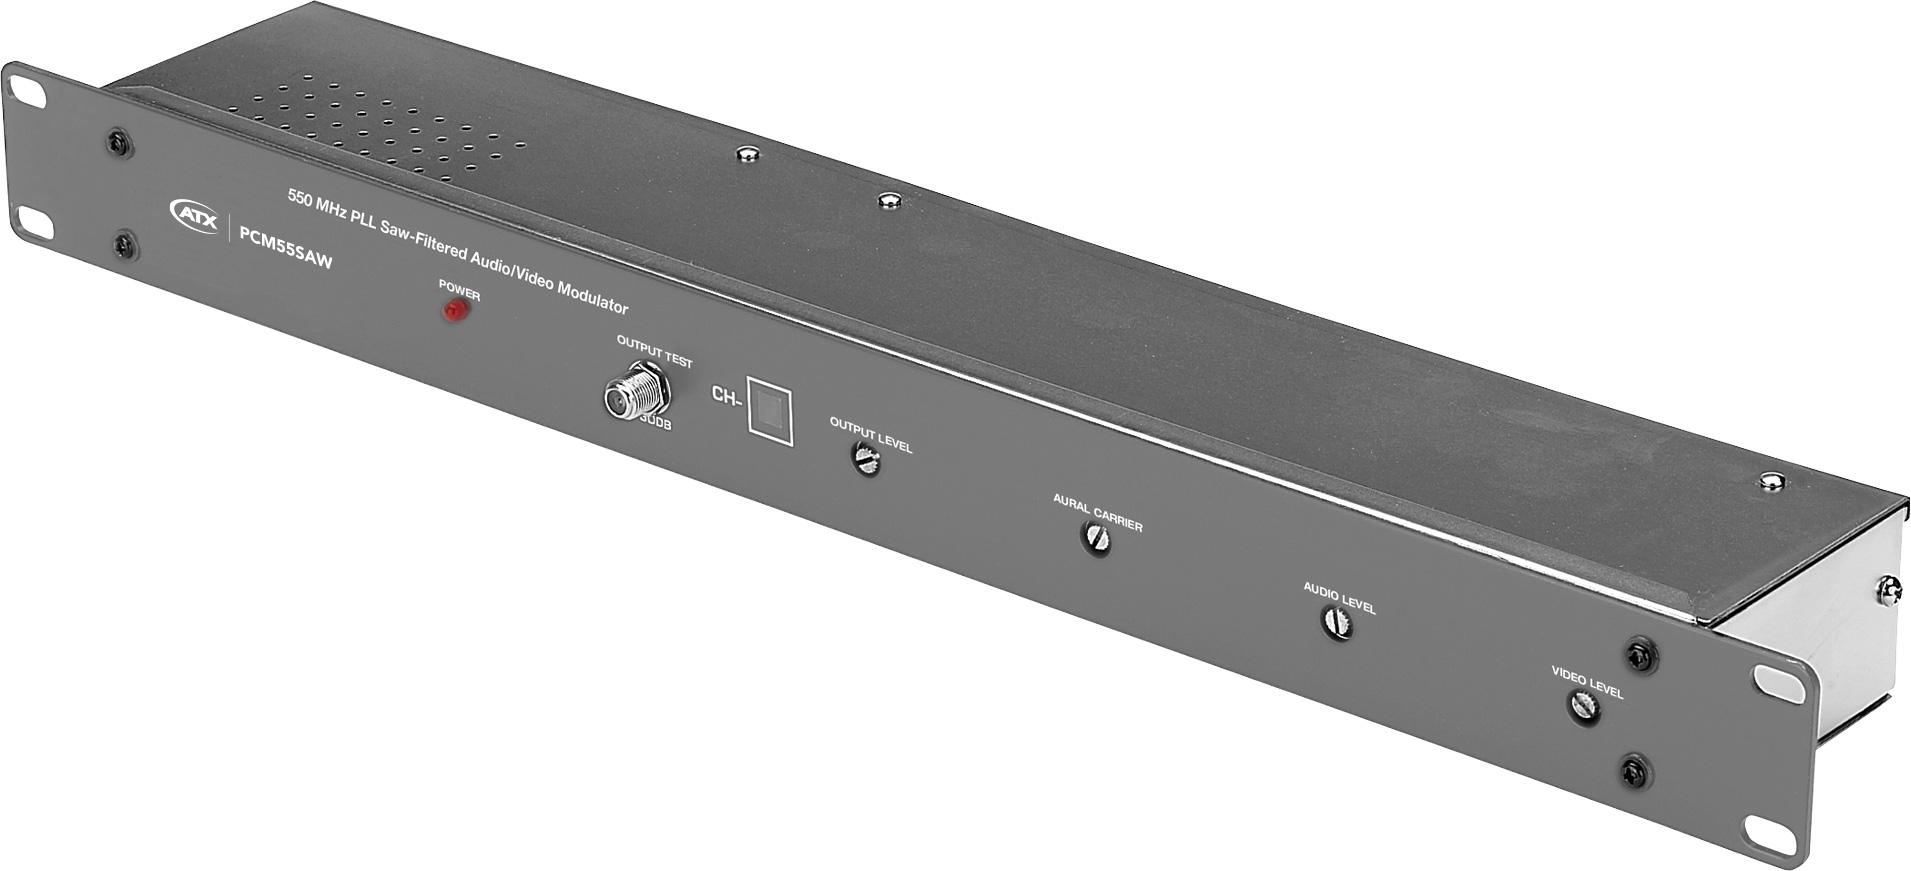 1 Channel Crystal A/V Modulator - Channel 14 PM-PCM55SAW-14